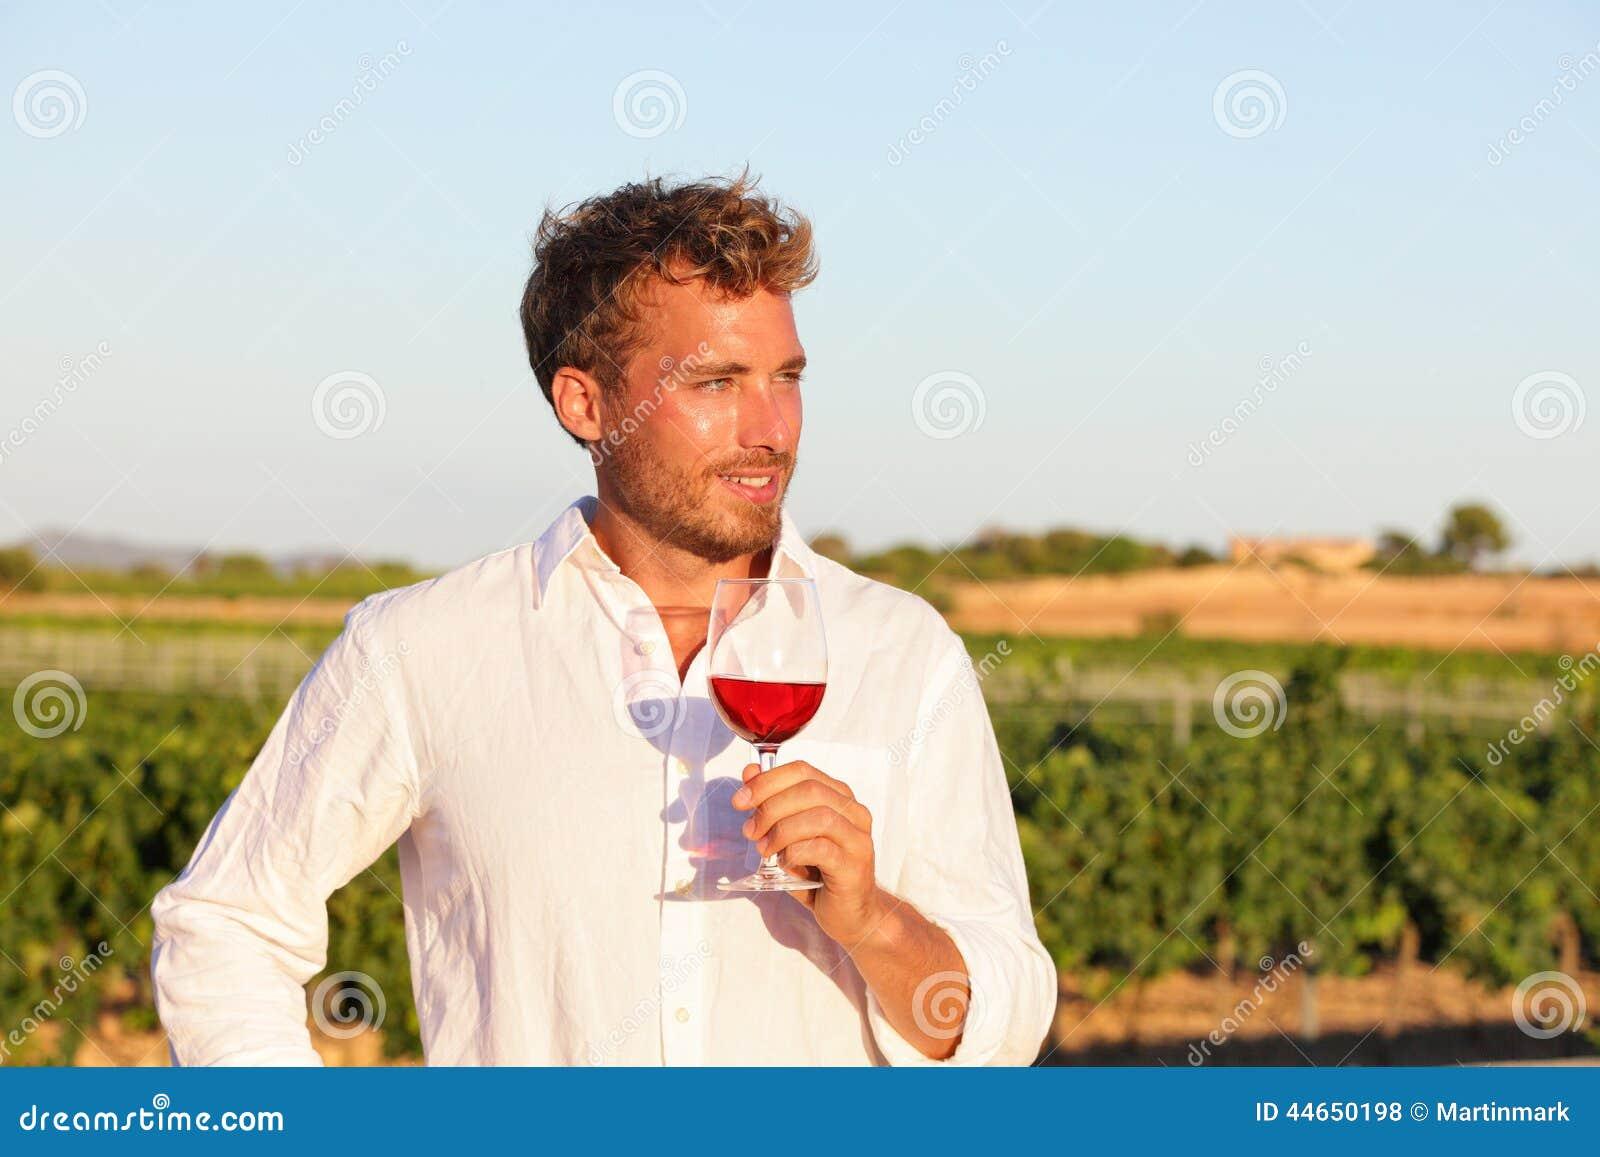 Winemaker man drinking rose or red wine, vineyard